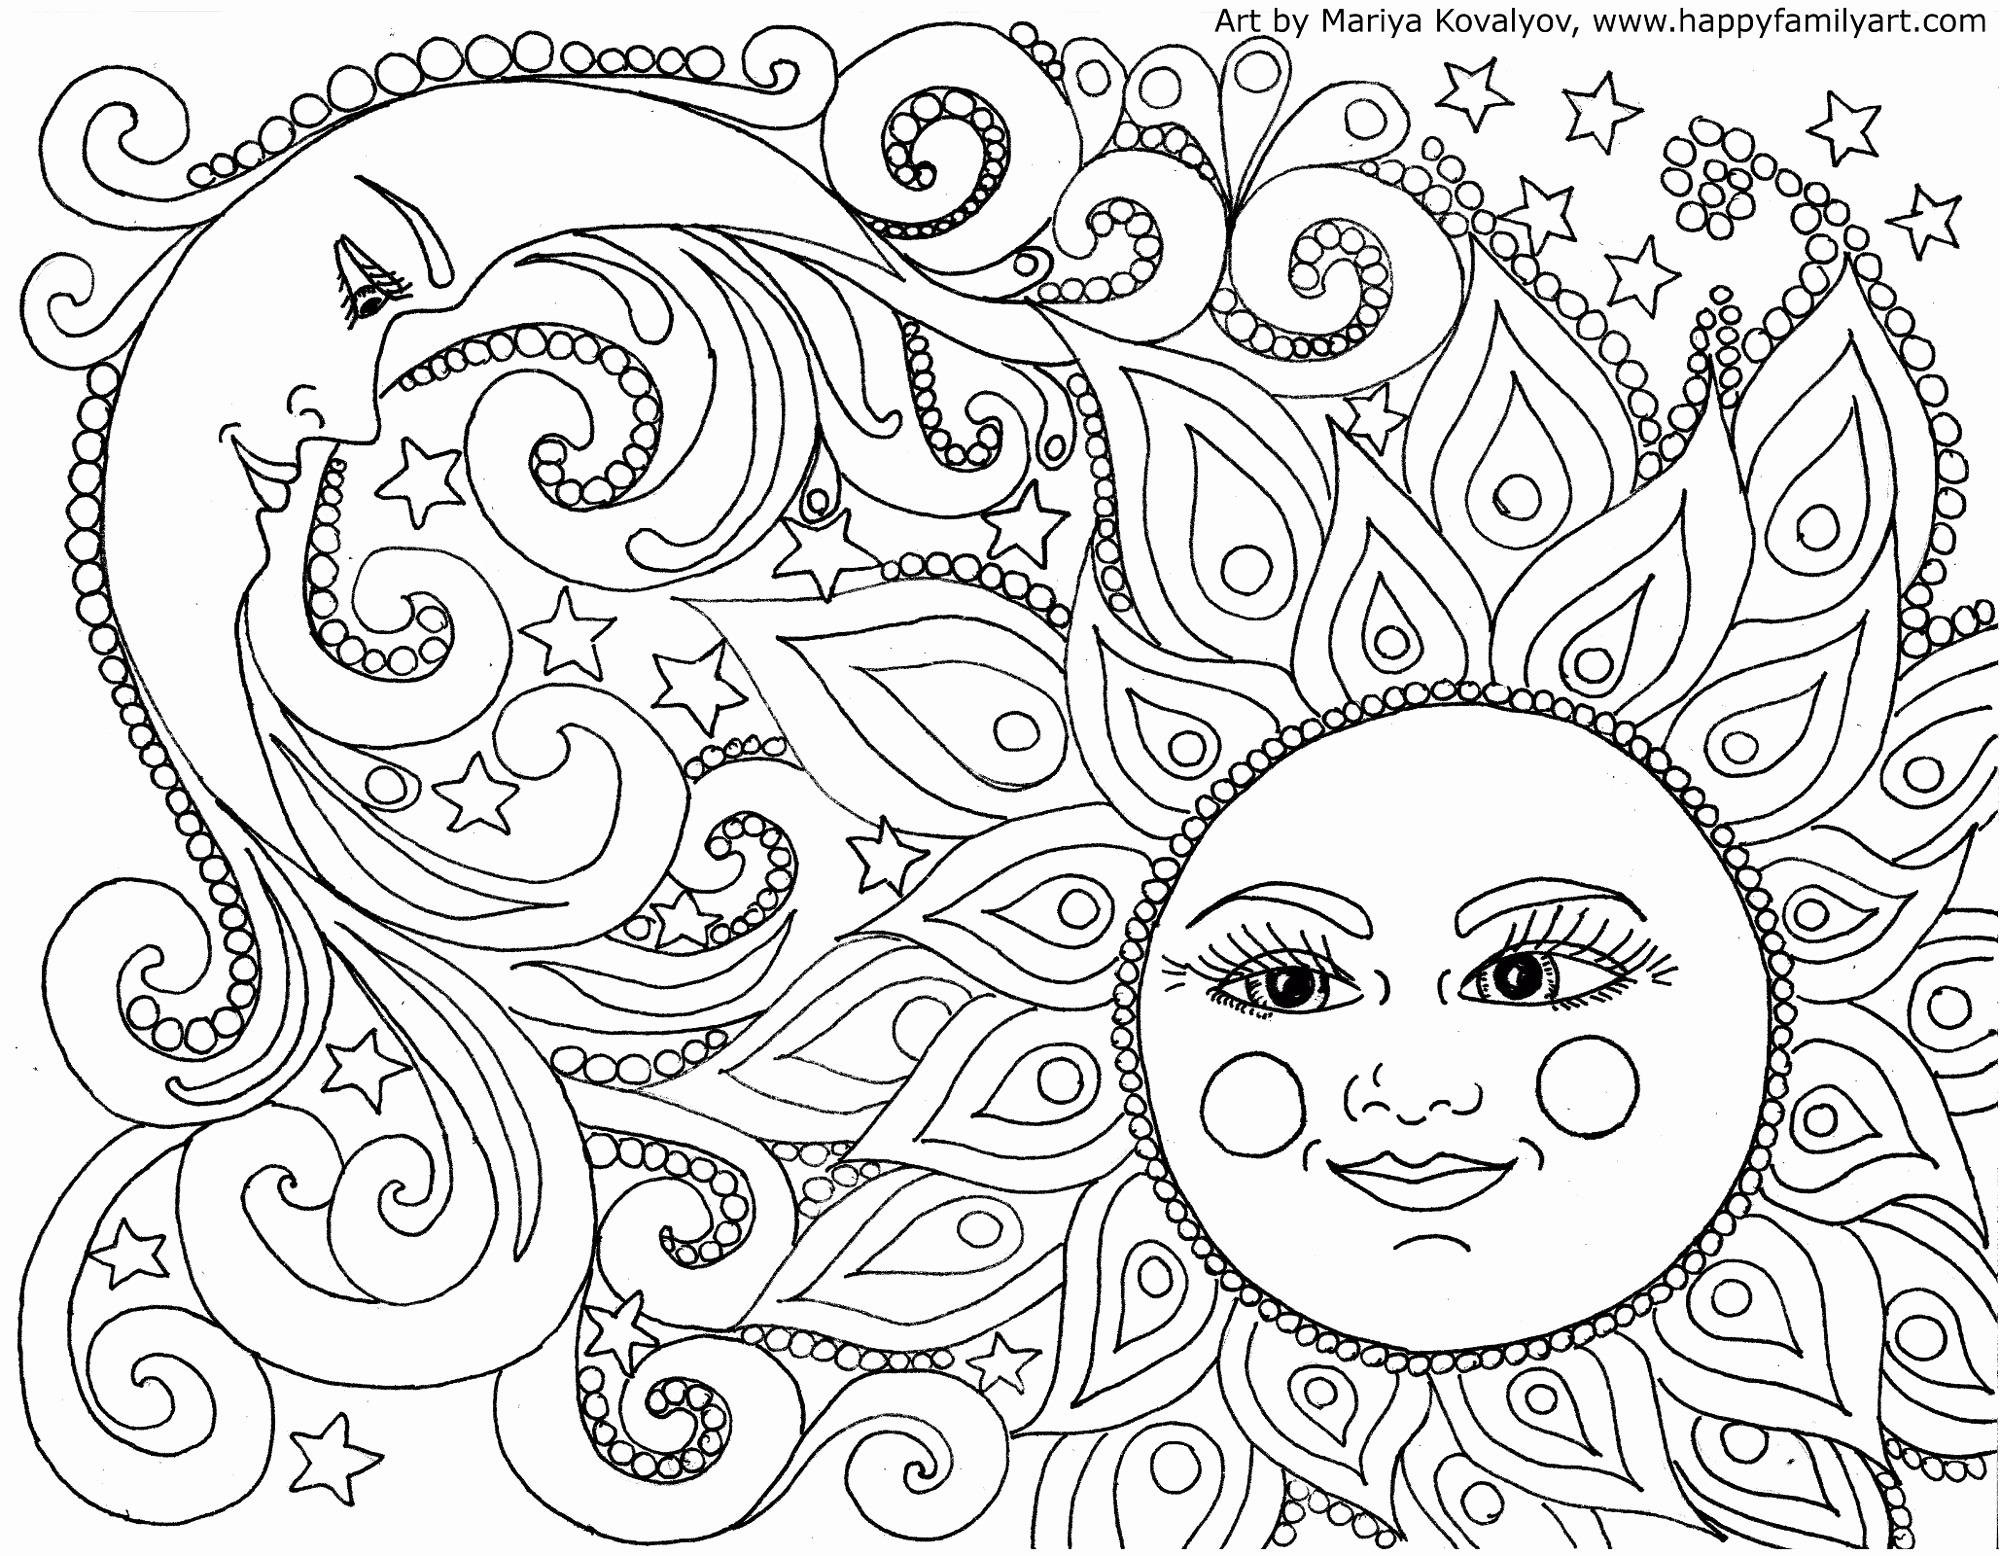 Coloring Pages : Mandala Sun And Moon Coloring Free dedans Mandala Fée